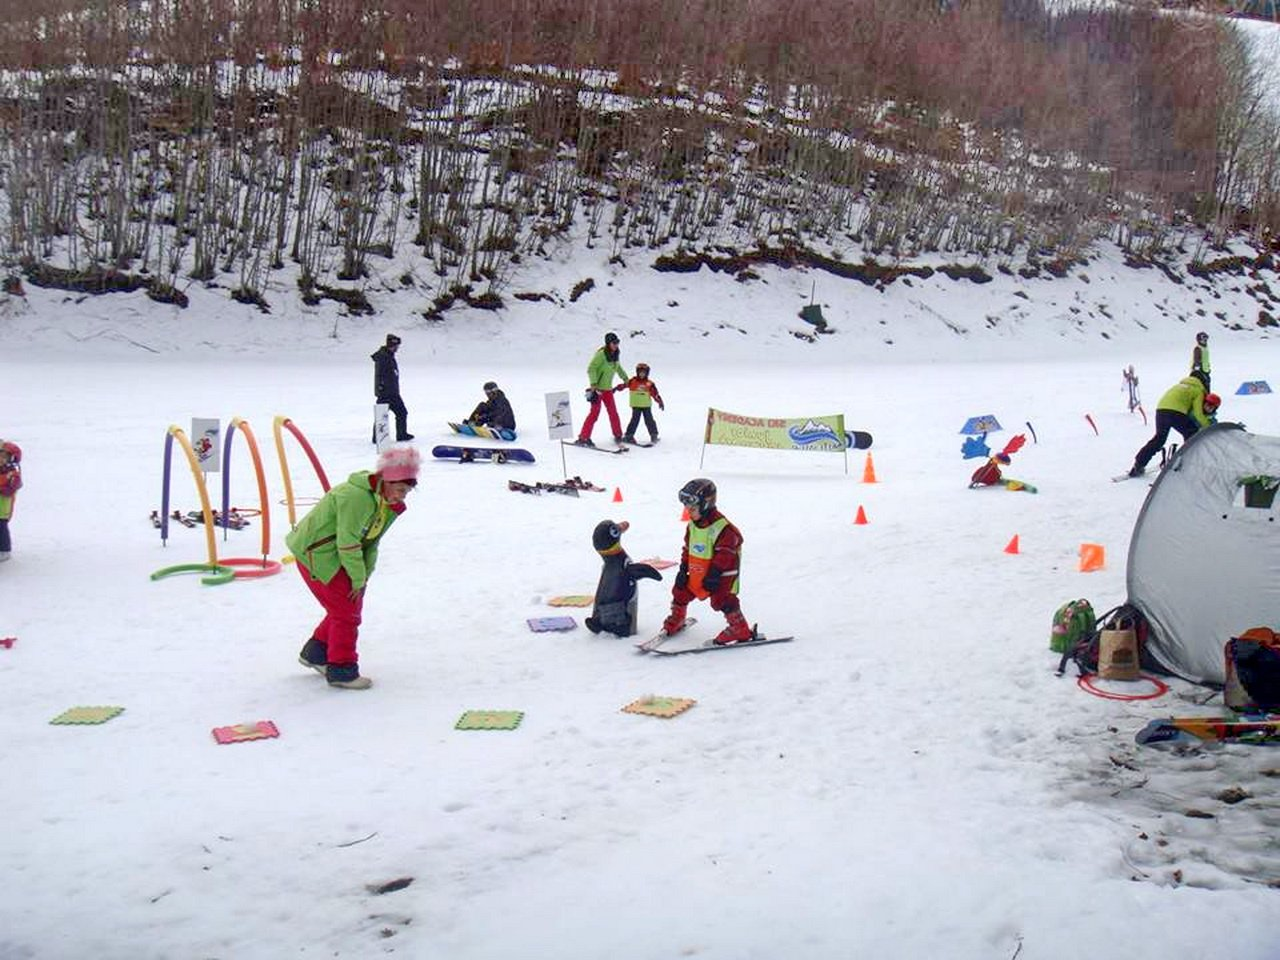 skiteam.gr-ski-academy-thessaloniki-2nd-weekend-18-19-january-2015-3-5-pigadiai-10